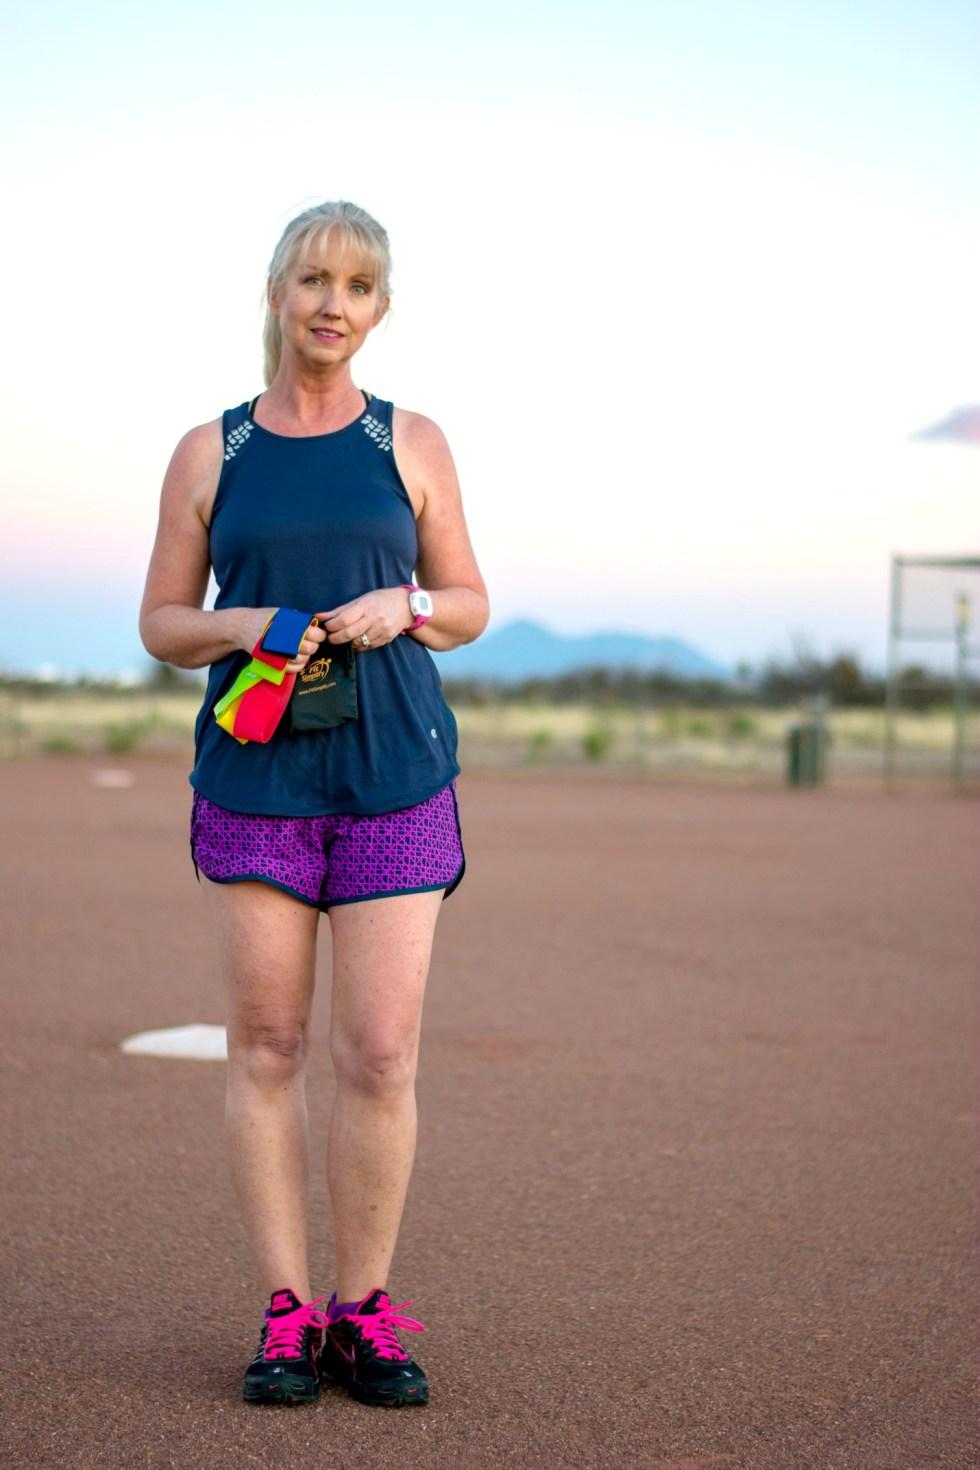 15 Reasons Women 50+ Should Lift Weights